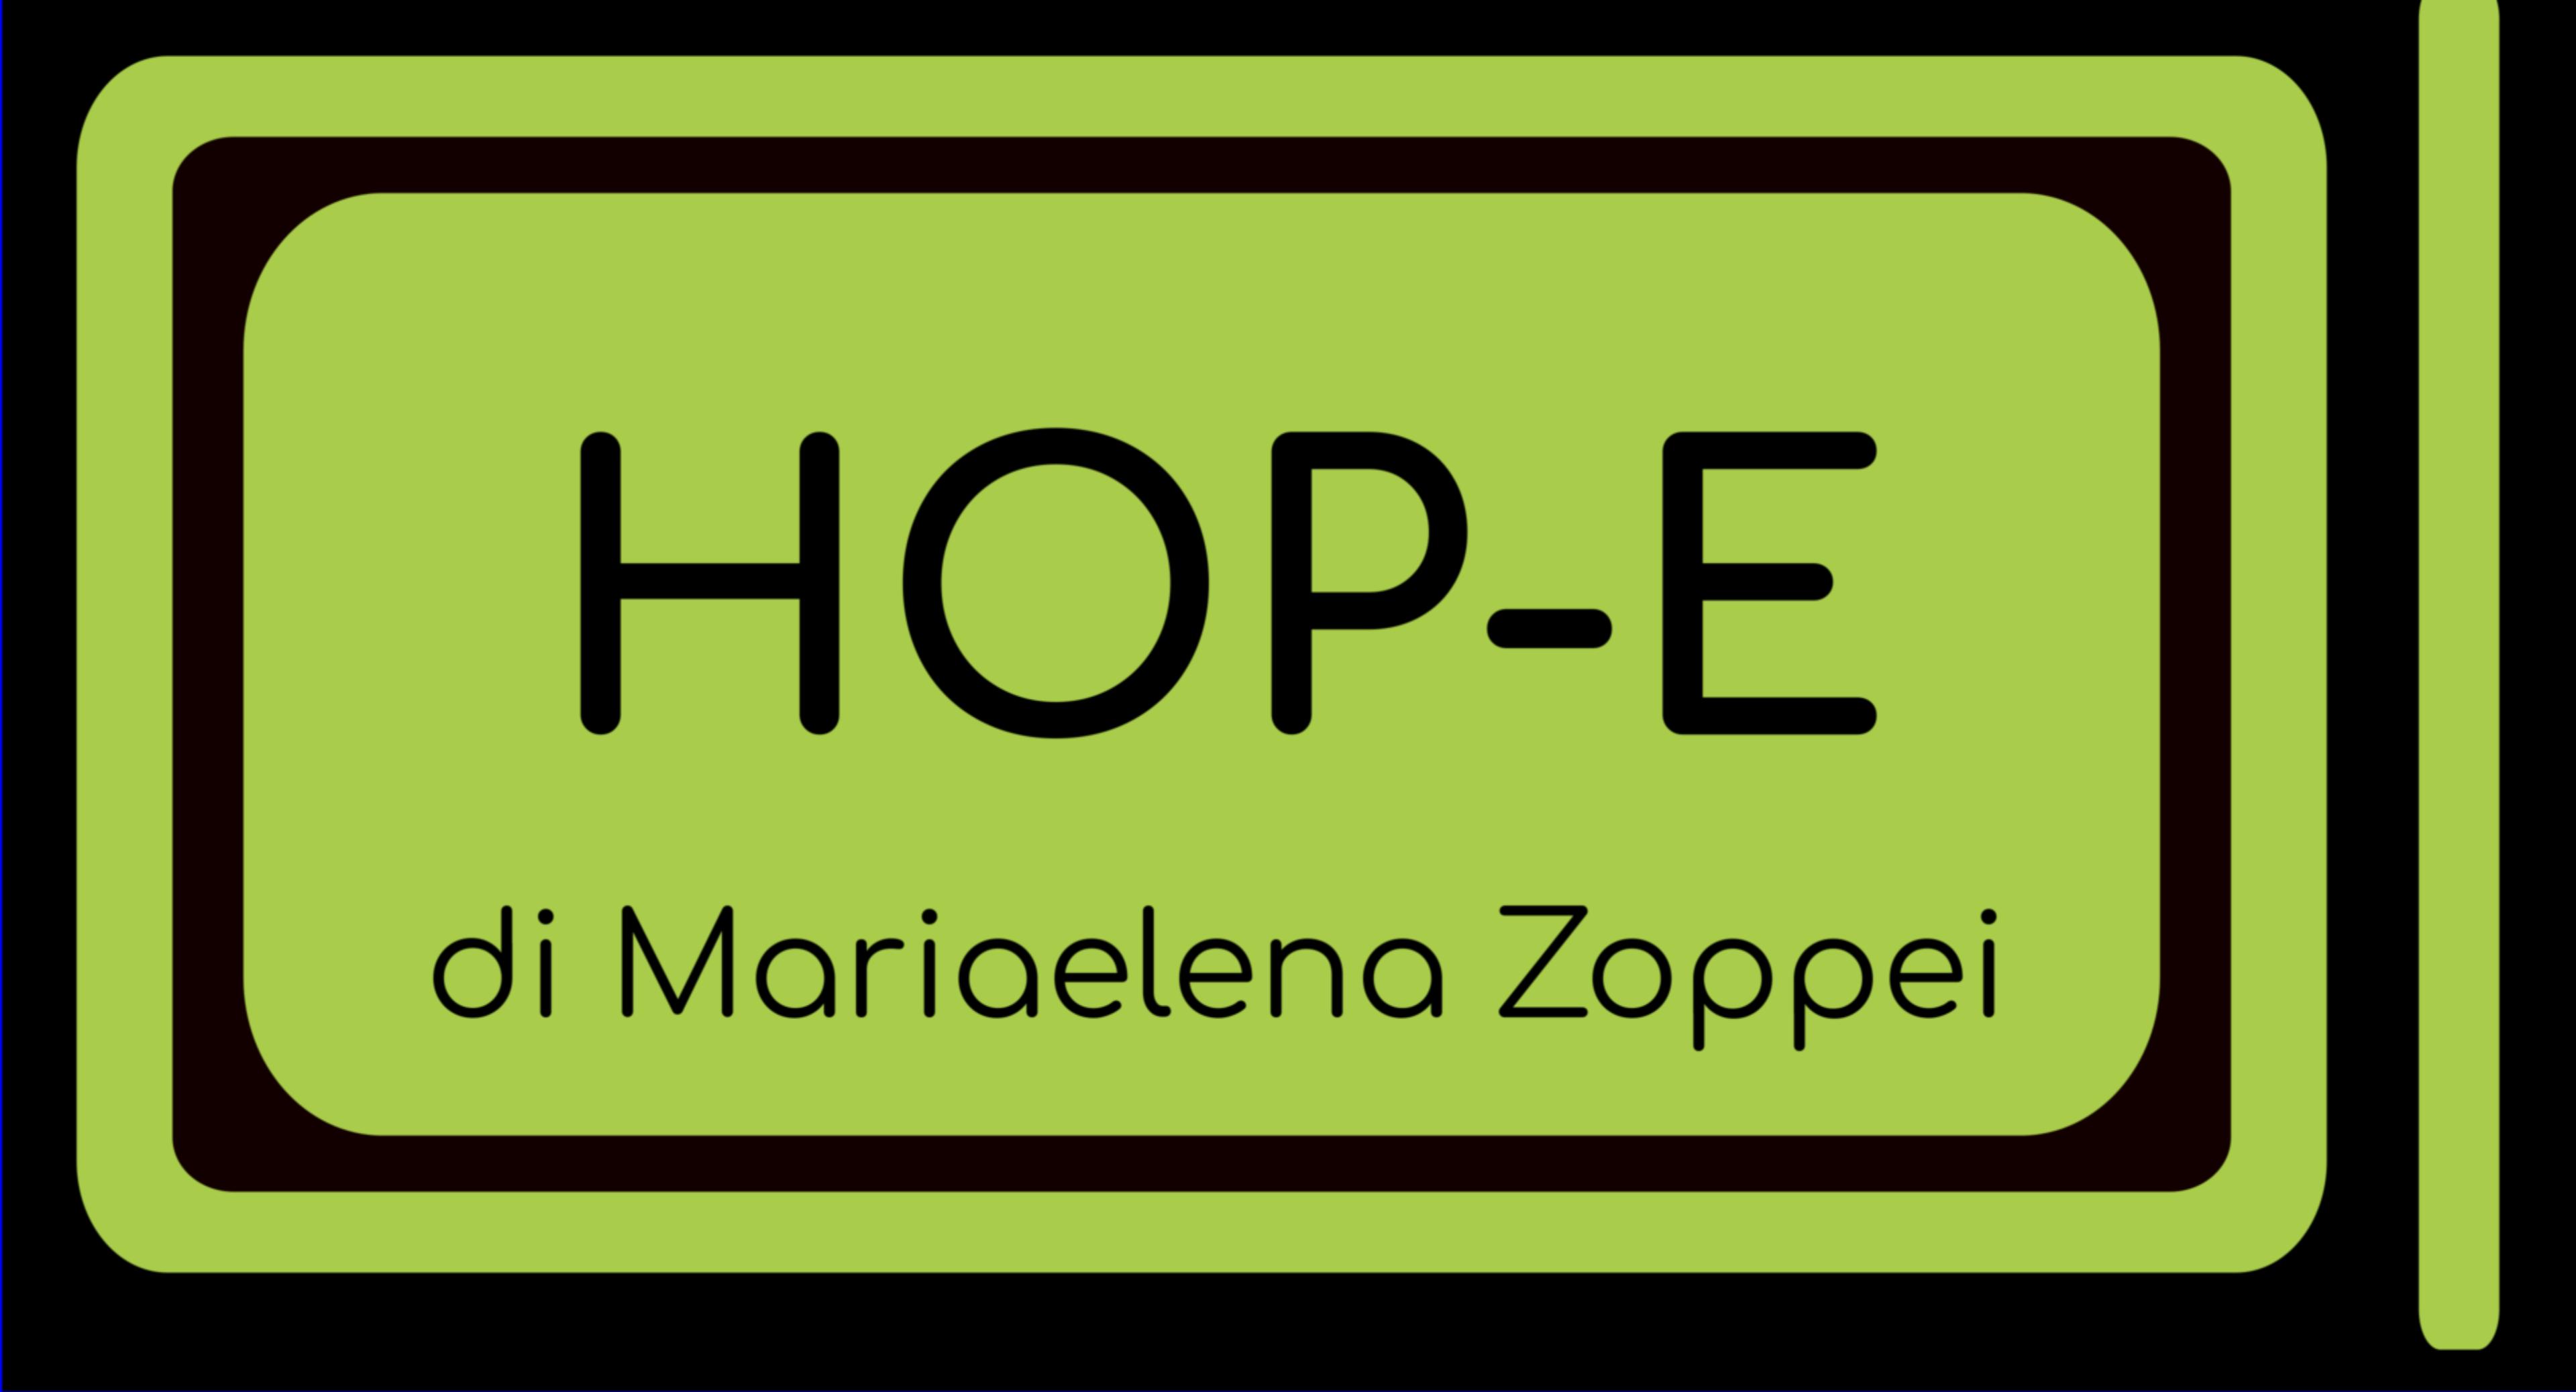 Hop-e di Mariaelena Zoppei